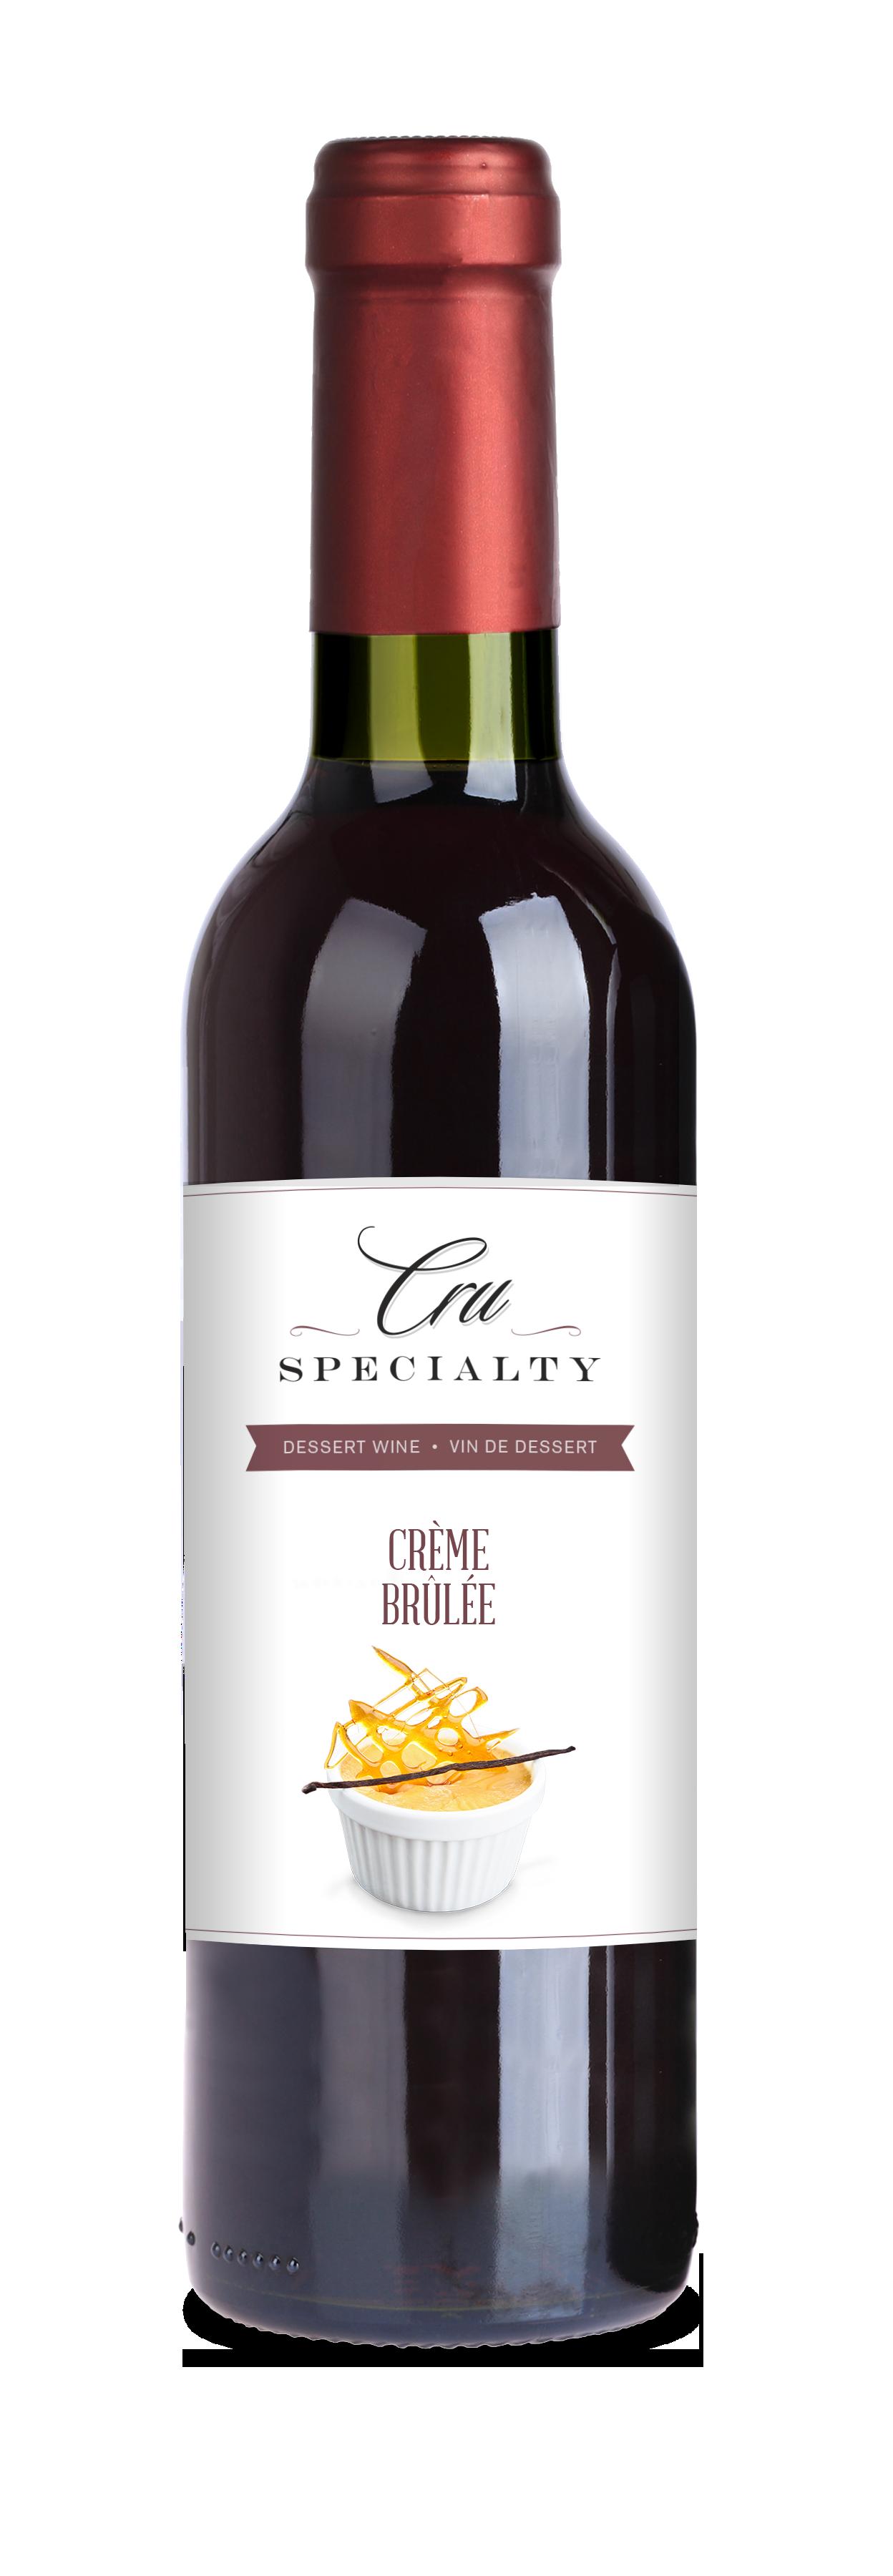 Cru Specialty Creme Brulee Dessert Wine, 12L (3.19 Gallons)-0